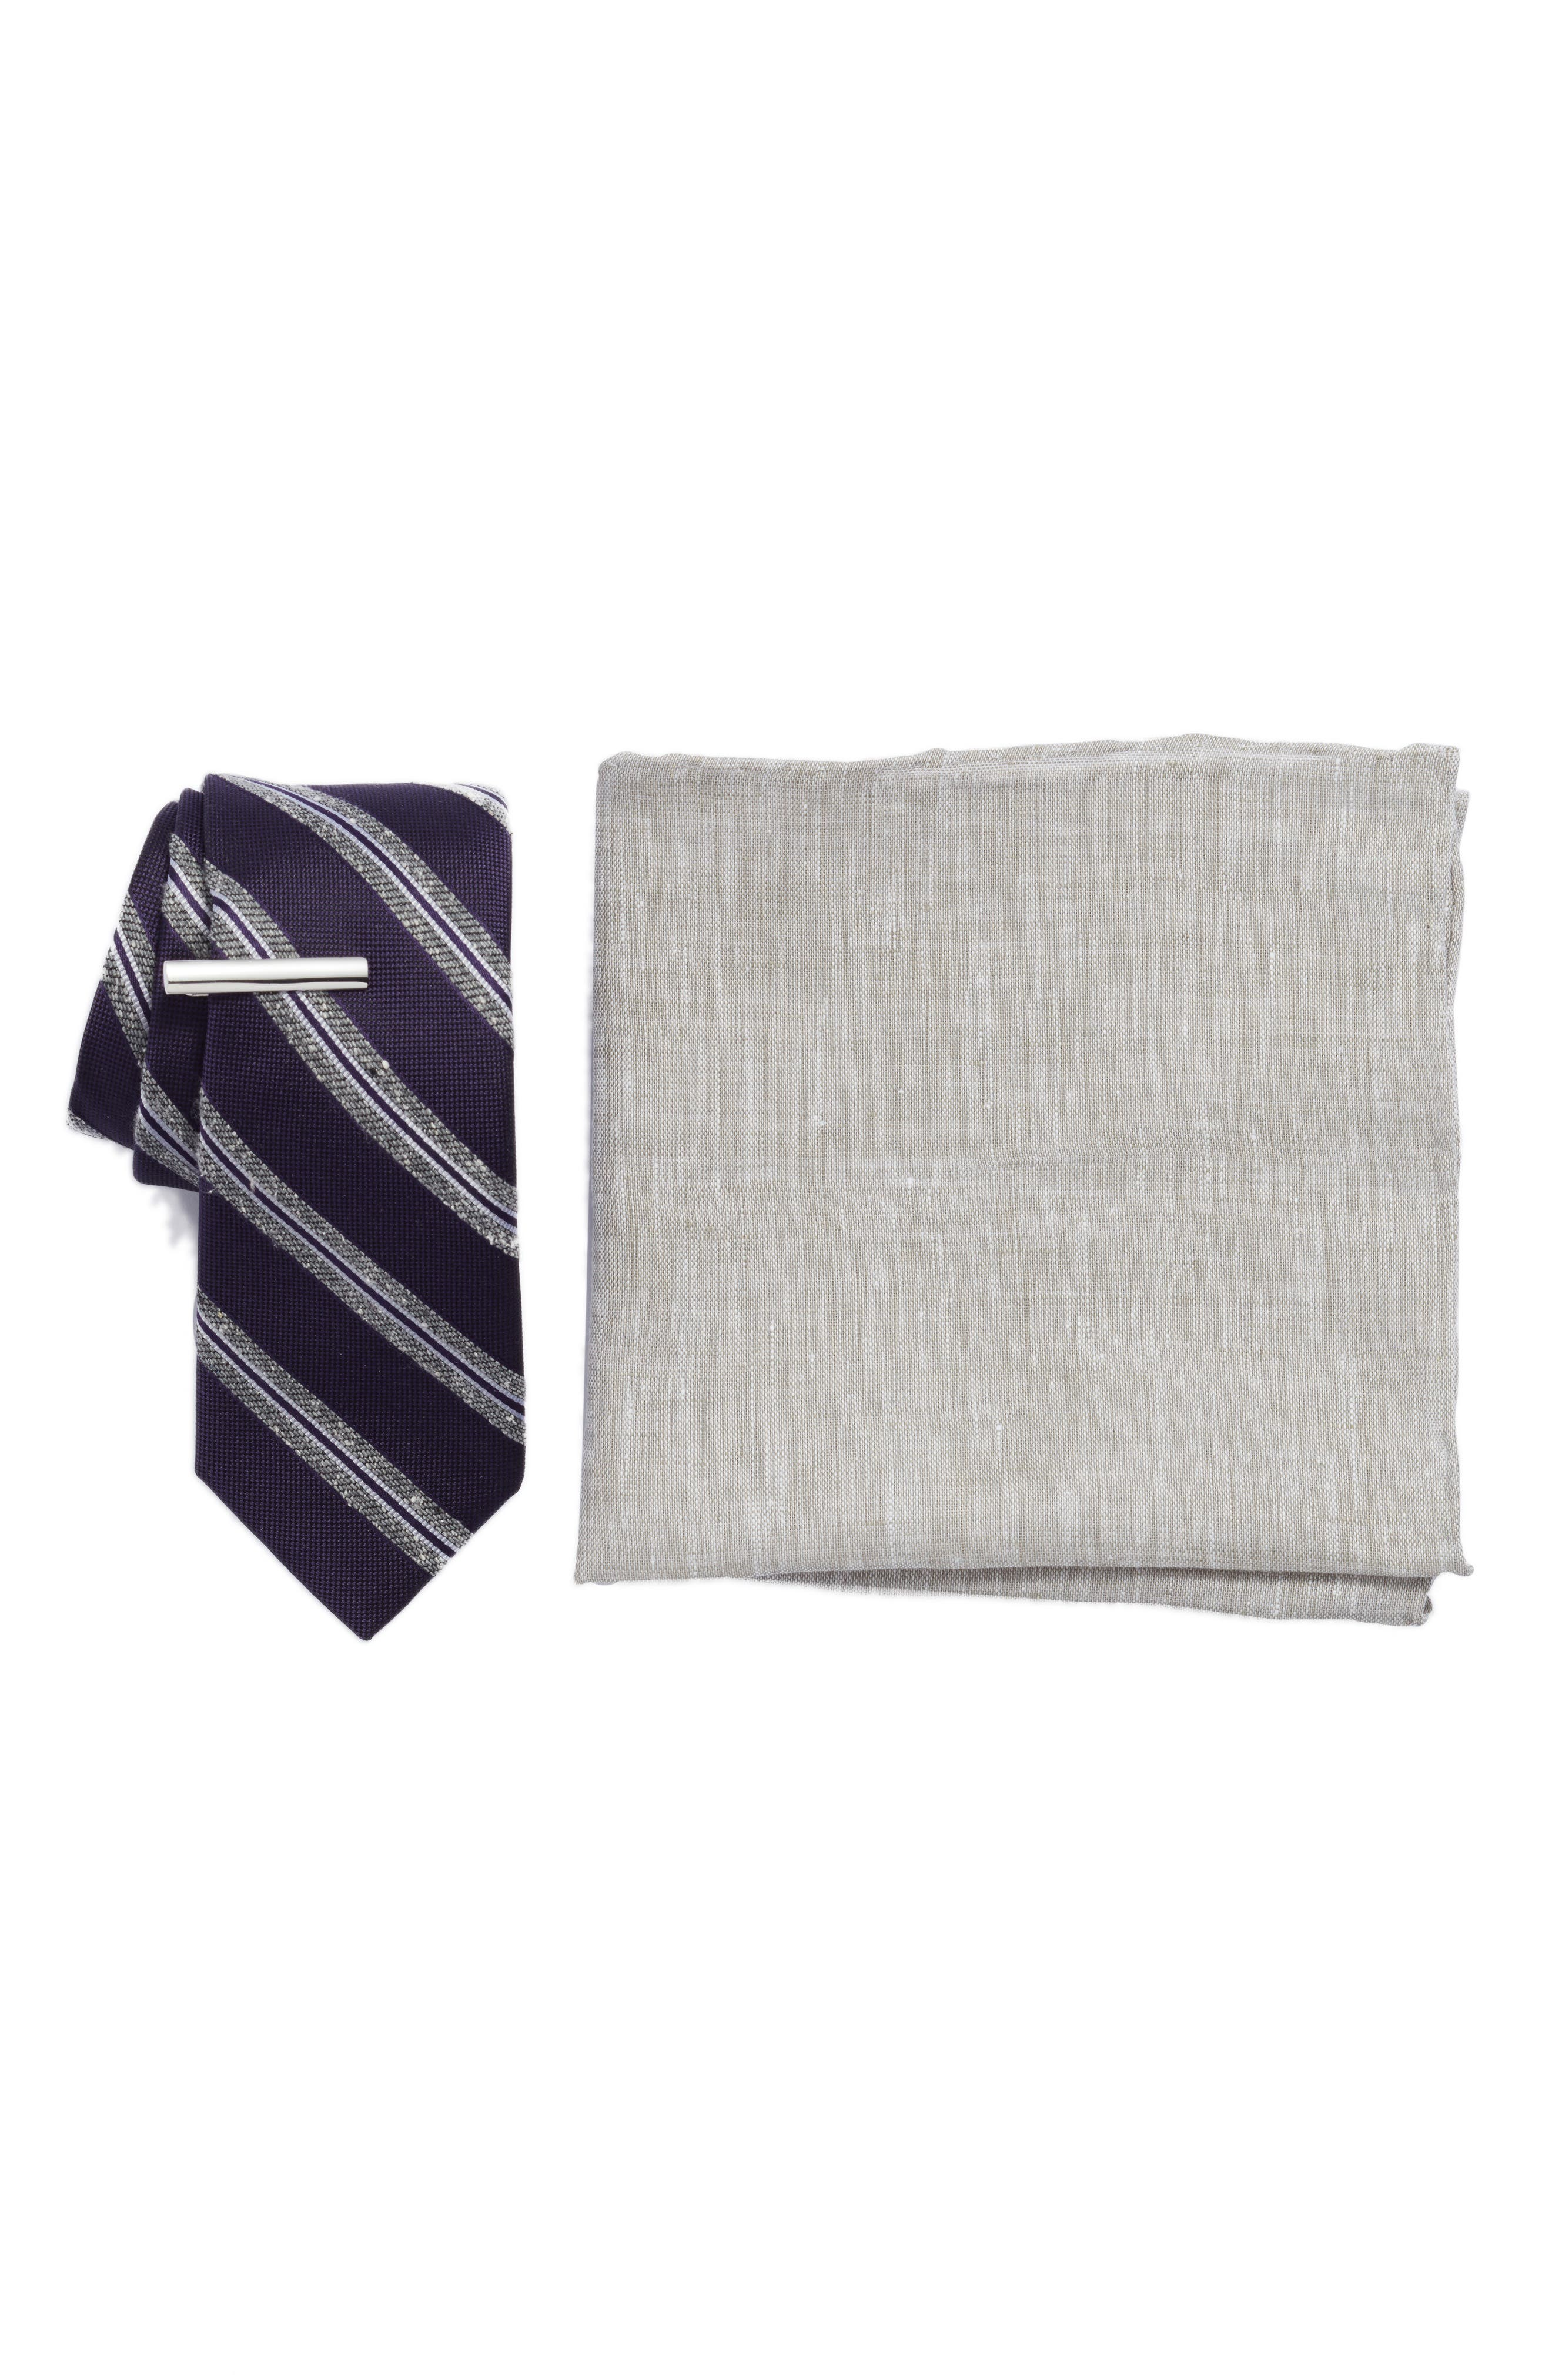 Edison Stripe 3-Piece Skinny Tie Style Box,                             Main thumbnail 1, color,                             EGGPLANT